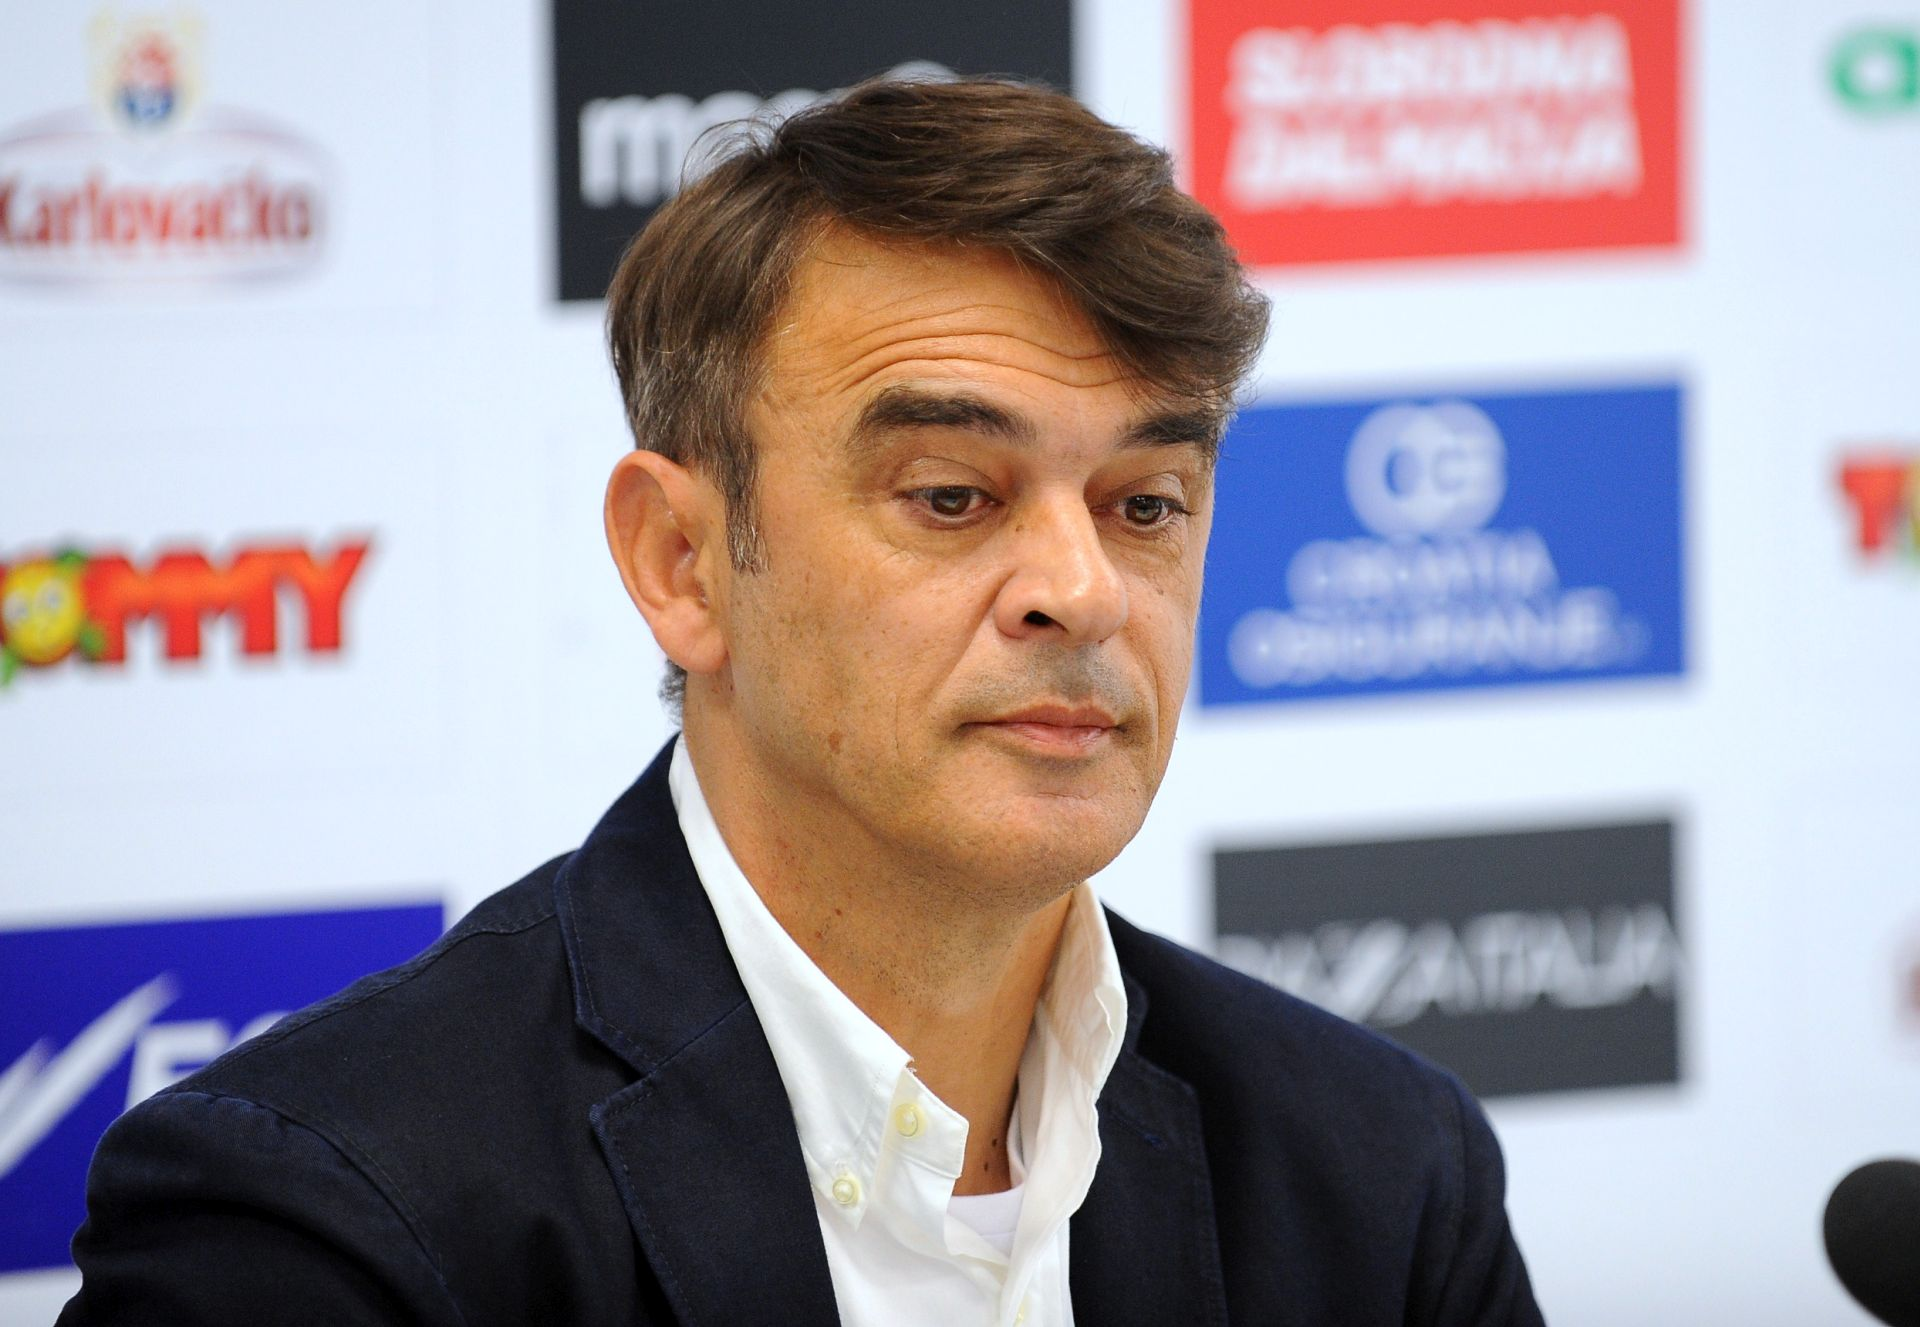 TRENER BURIĆ: Hajduk očekuje napeto razdoblje